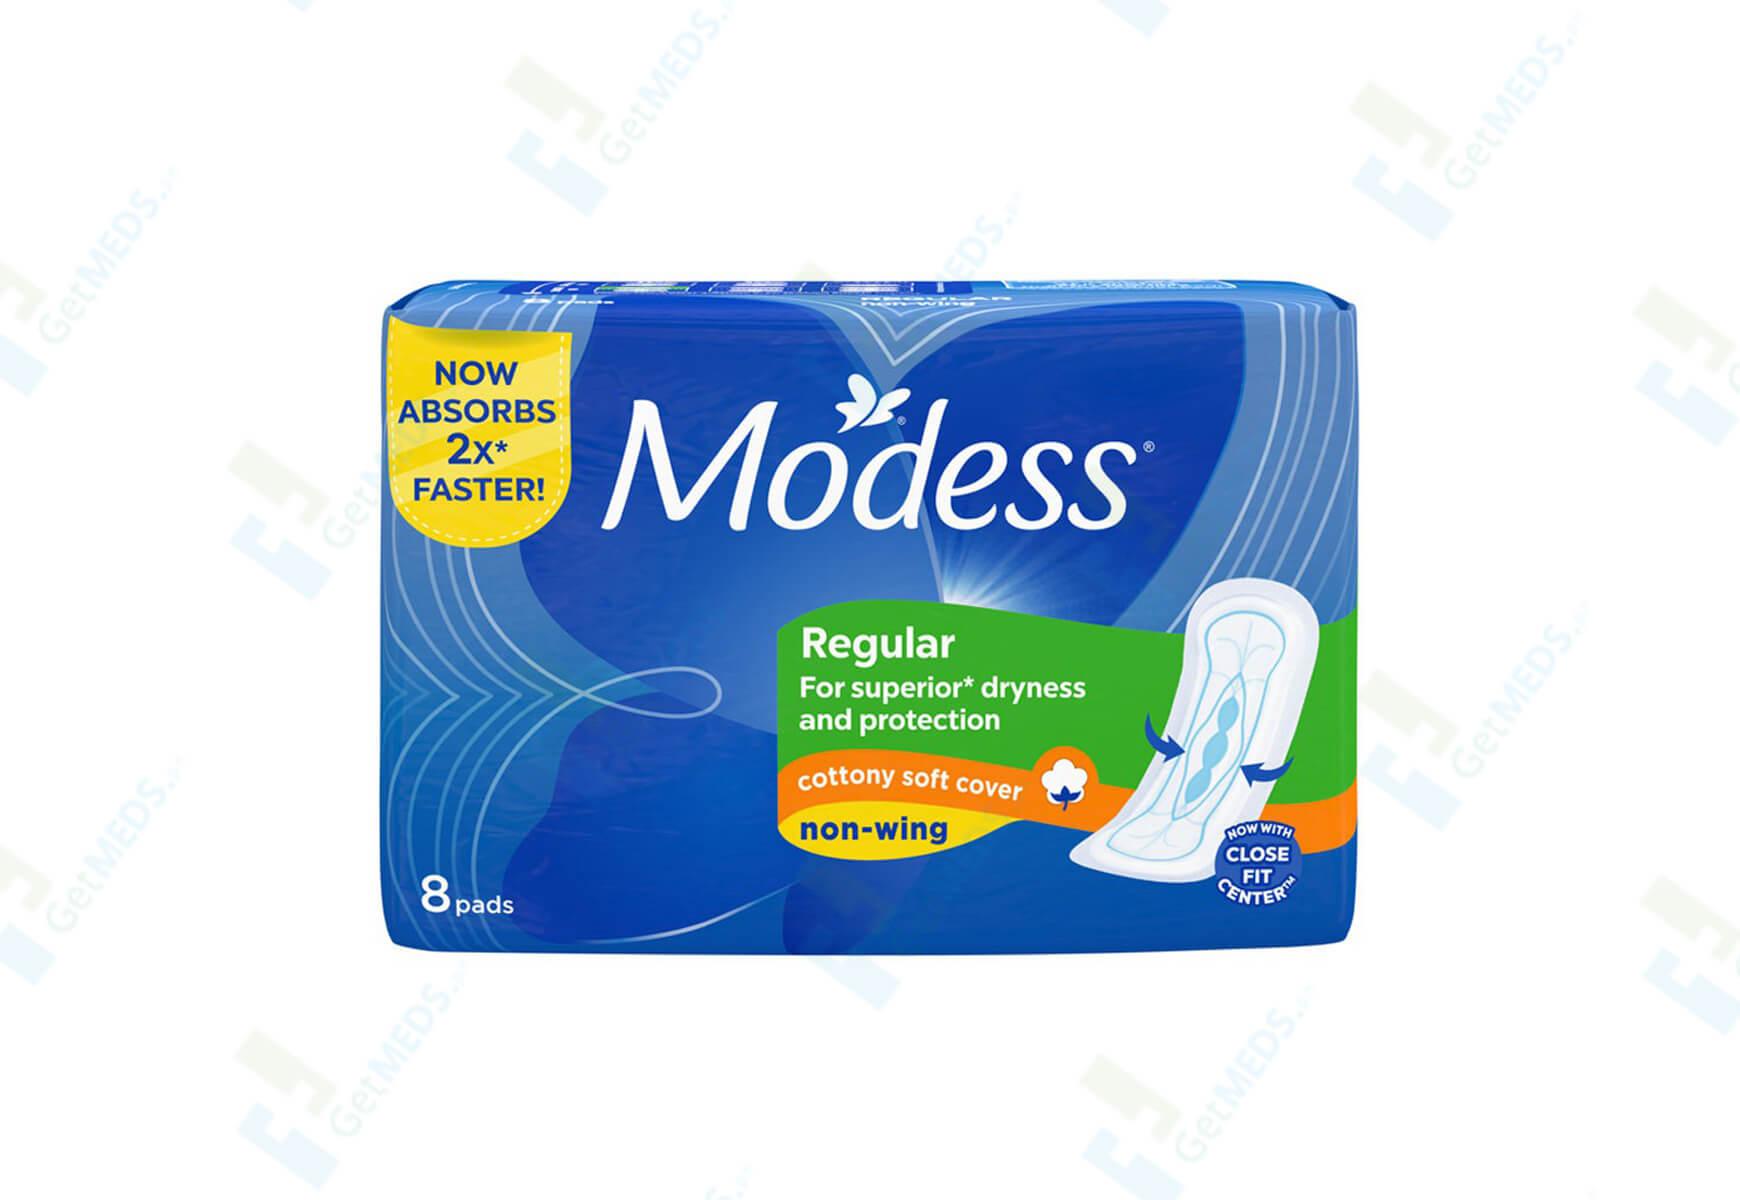 Modess Regular Non-wing